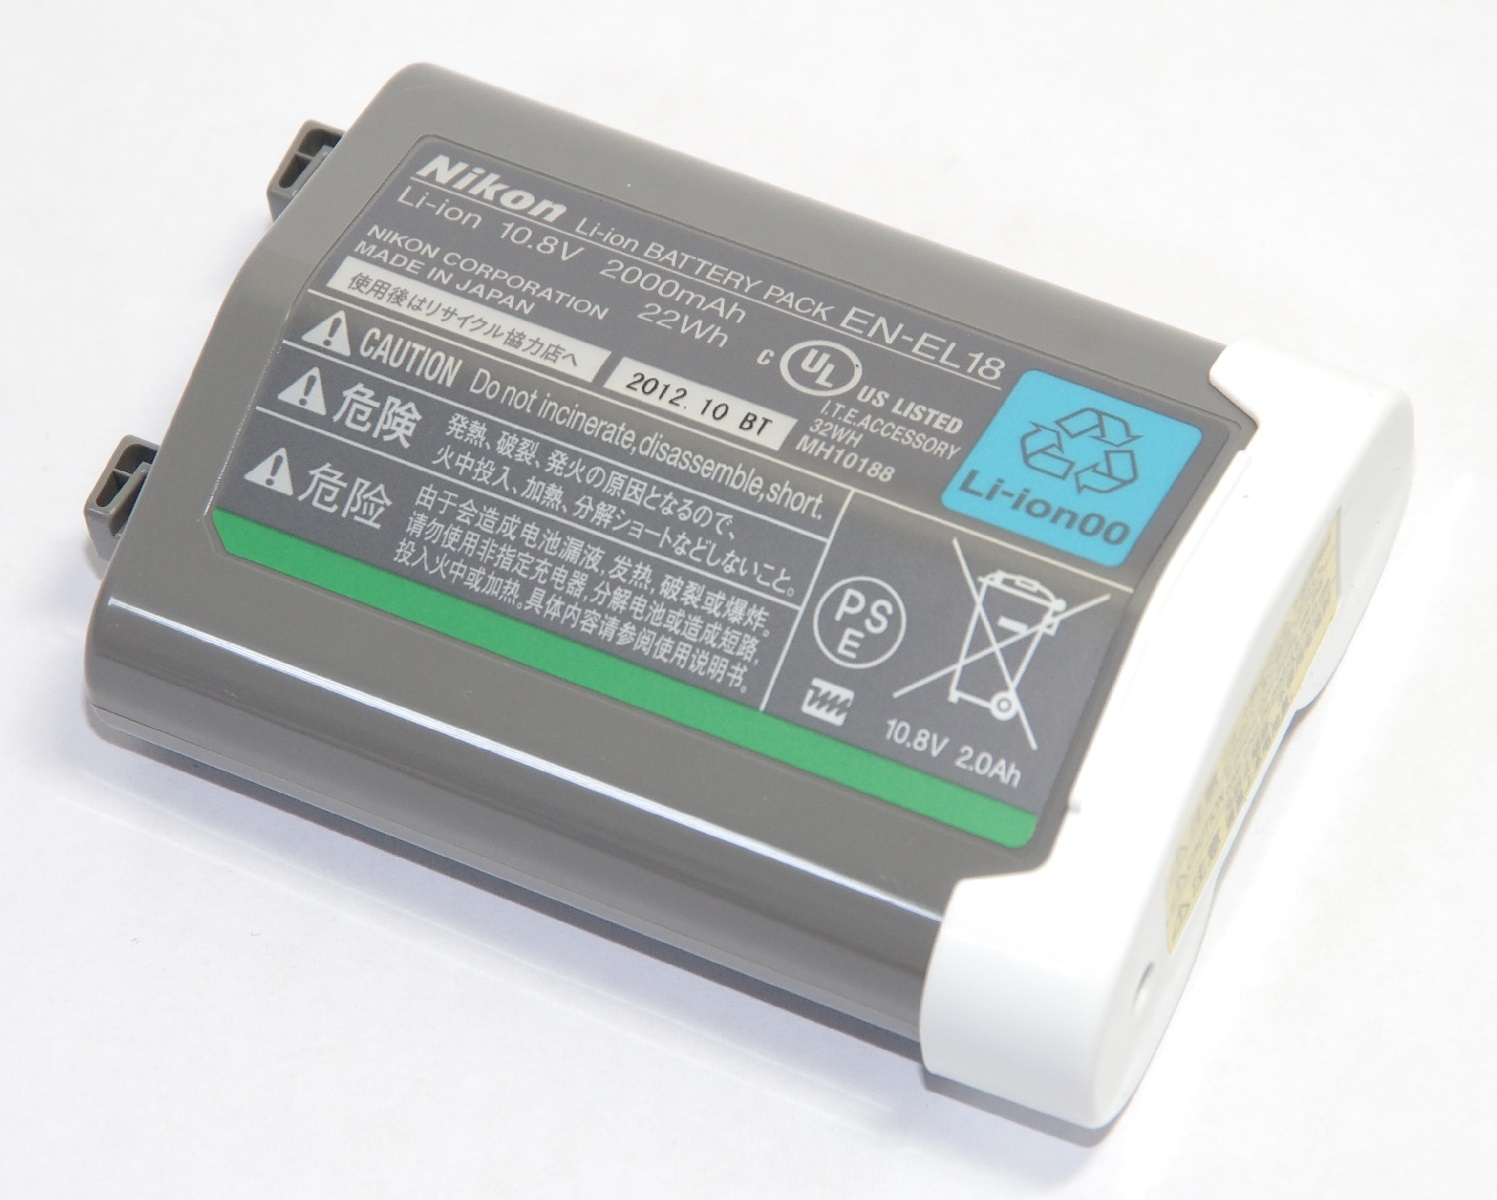 Nikon ニコン純正 EN-EL18 Li-ion リチャージャブルバッテリー D5.D4.D4S対応充電池 あす楽対応